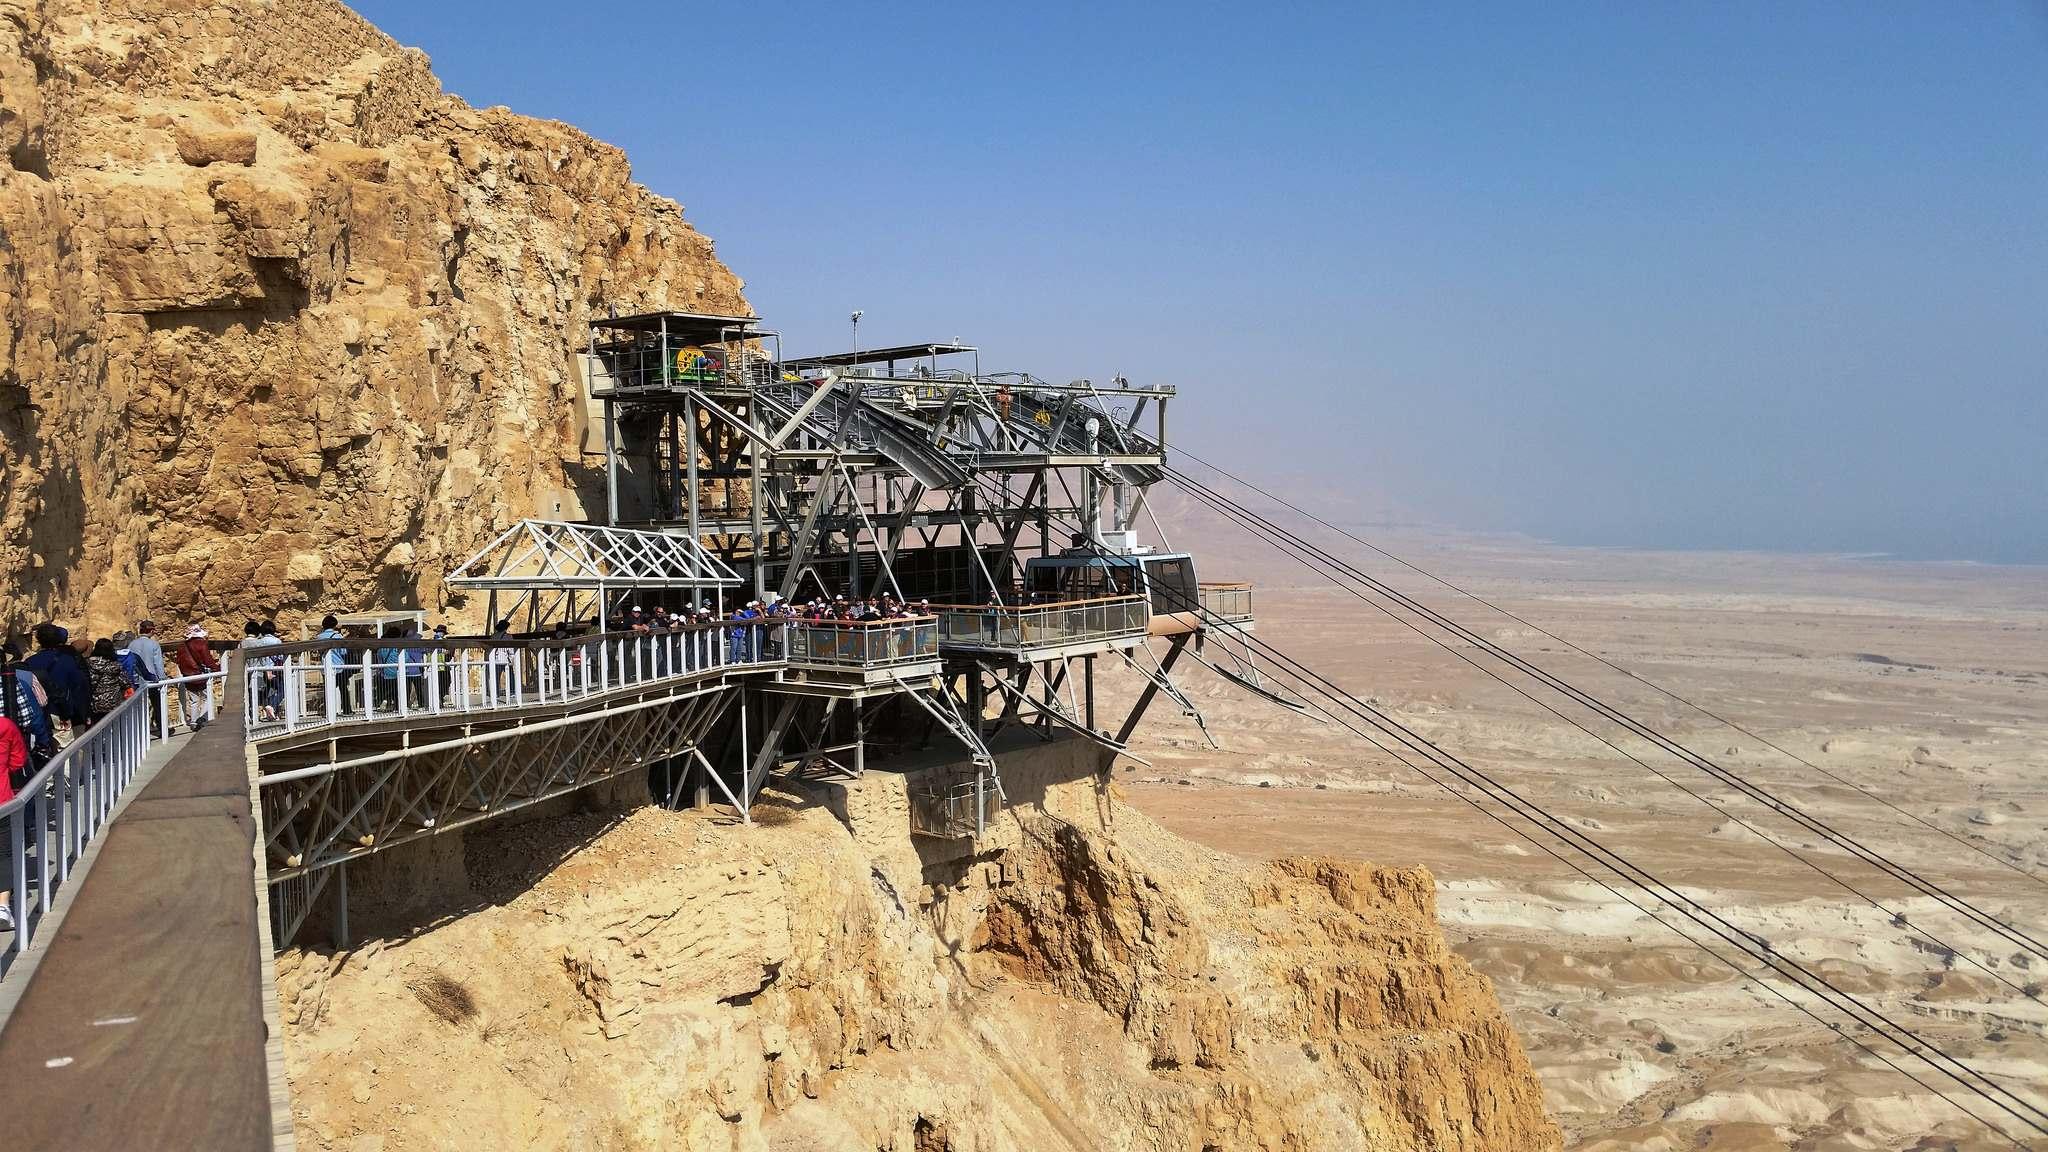 masada3 Masada Desert Fortress in Israel